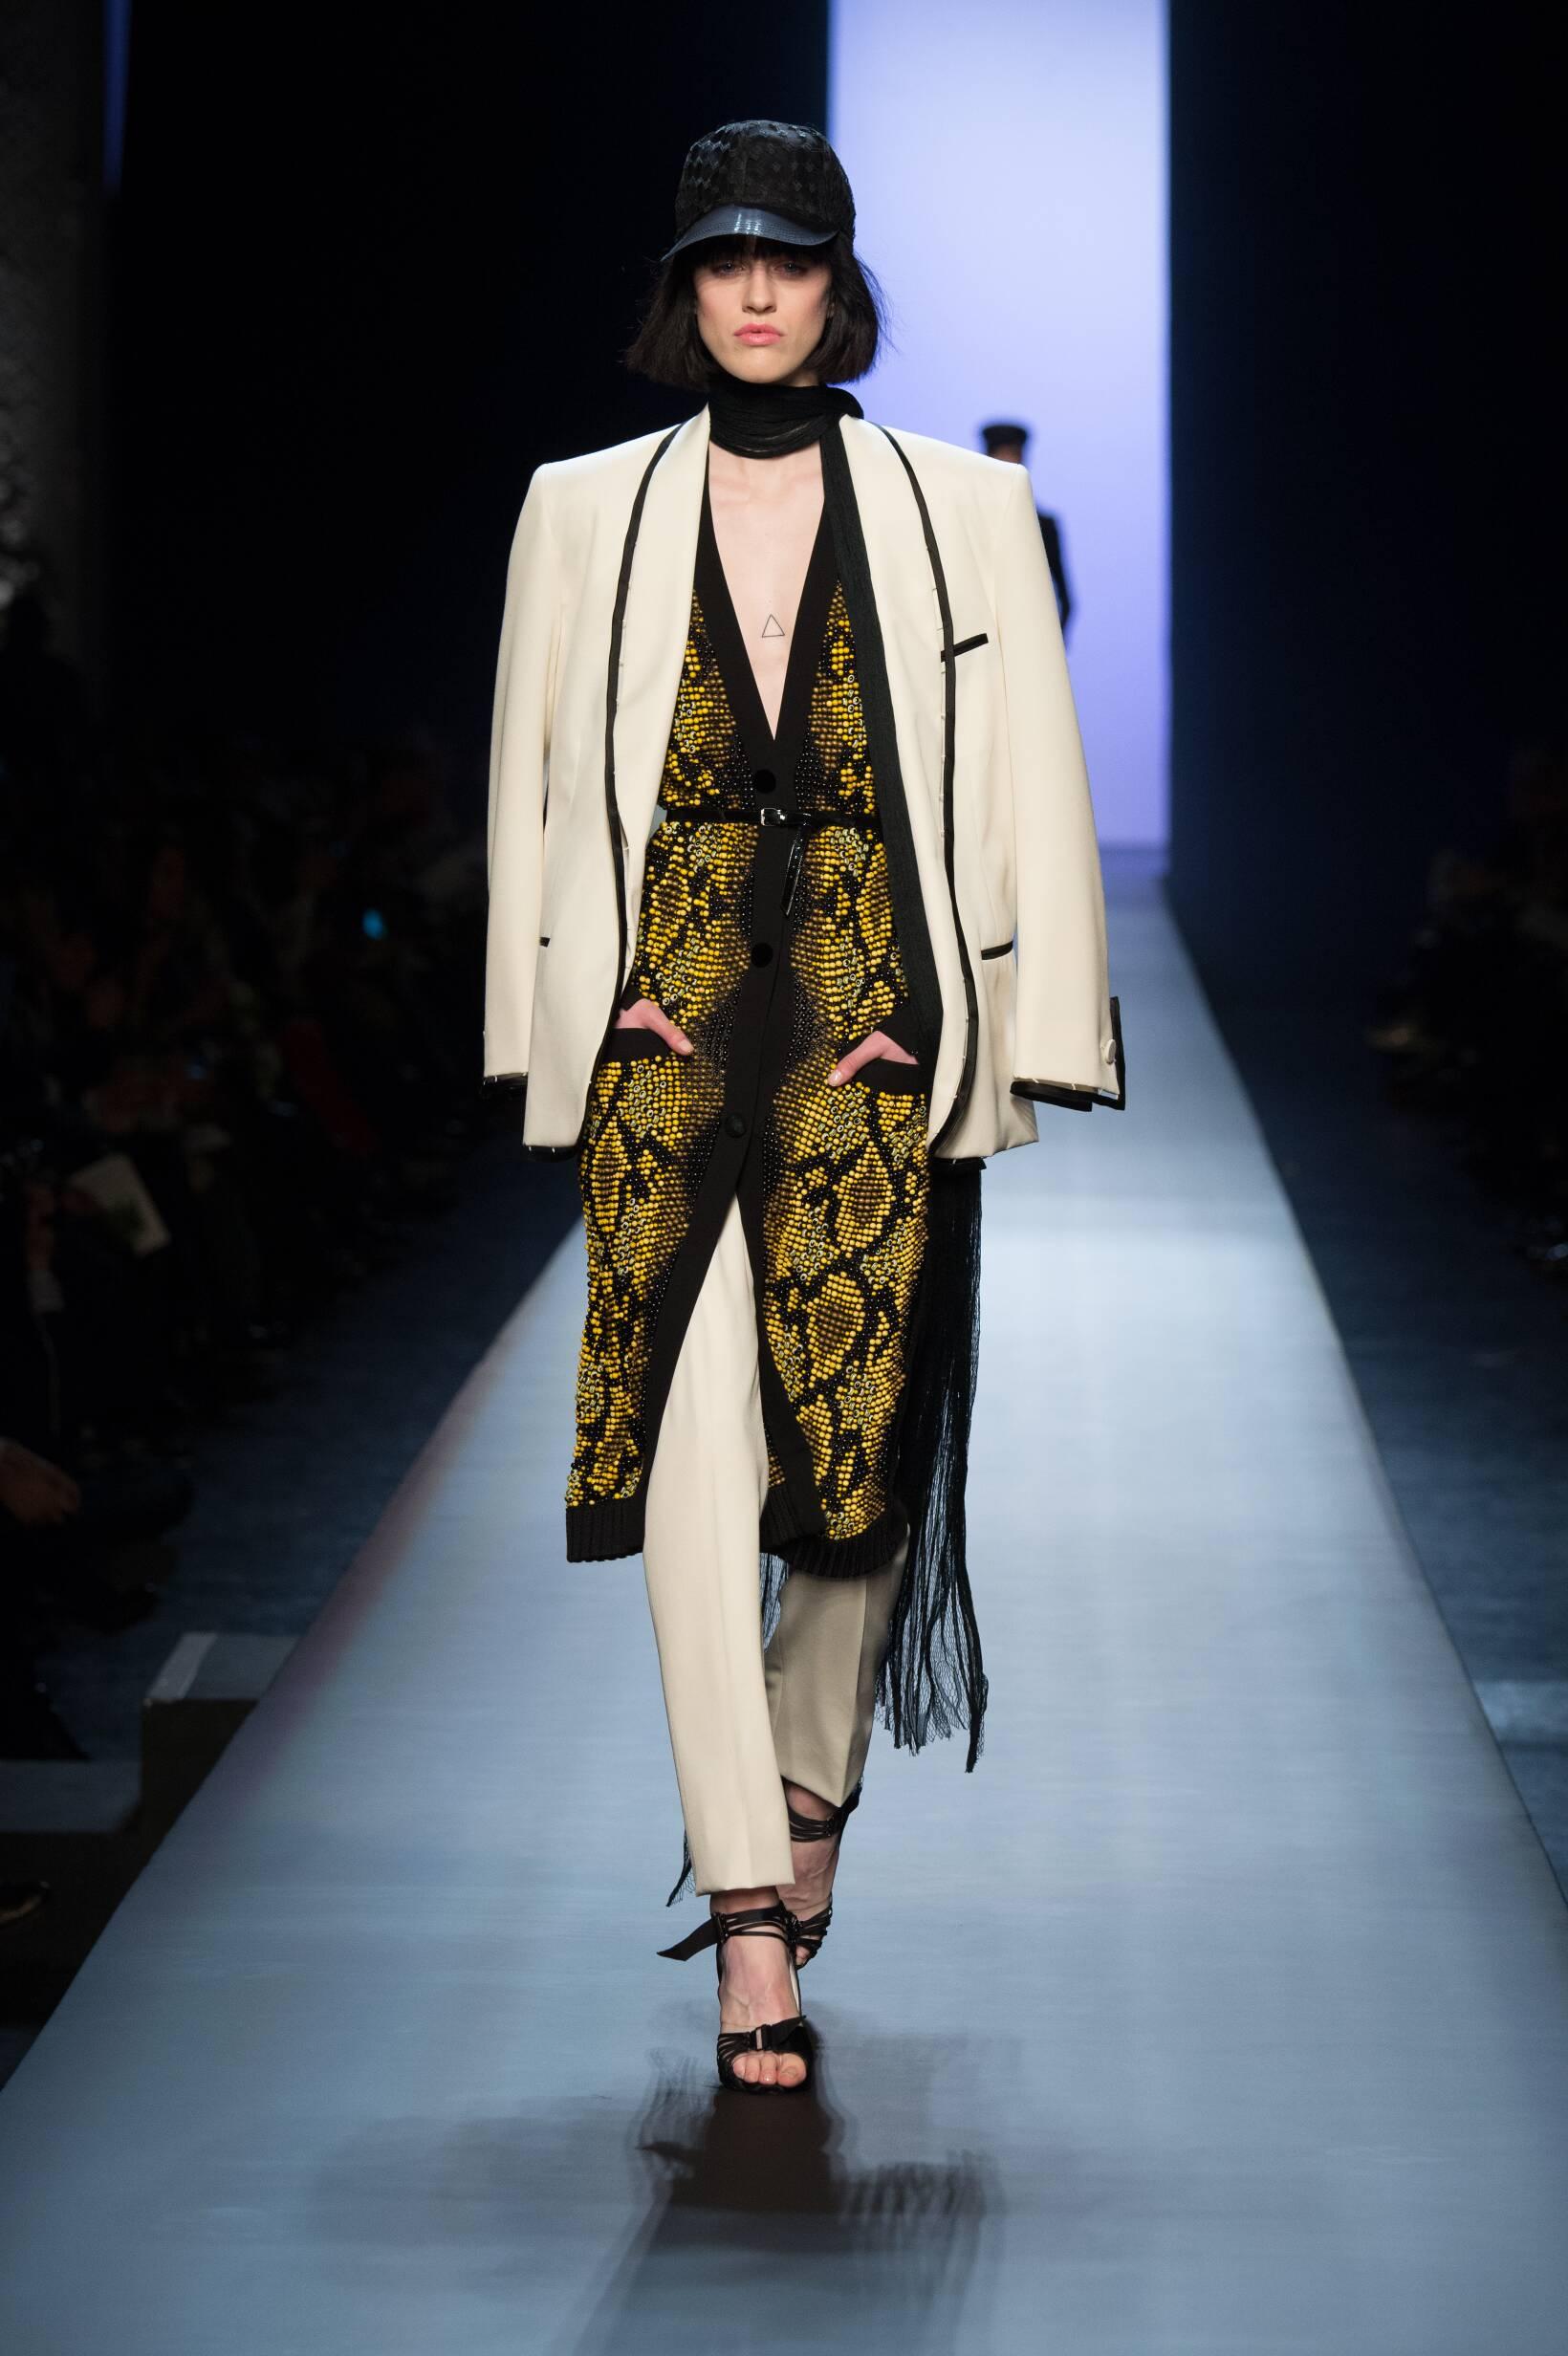 Runway Jean Paul Gaultier Haute Couture Spring Summer 2015 Women's Collection Paris Fashion Week